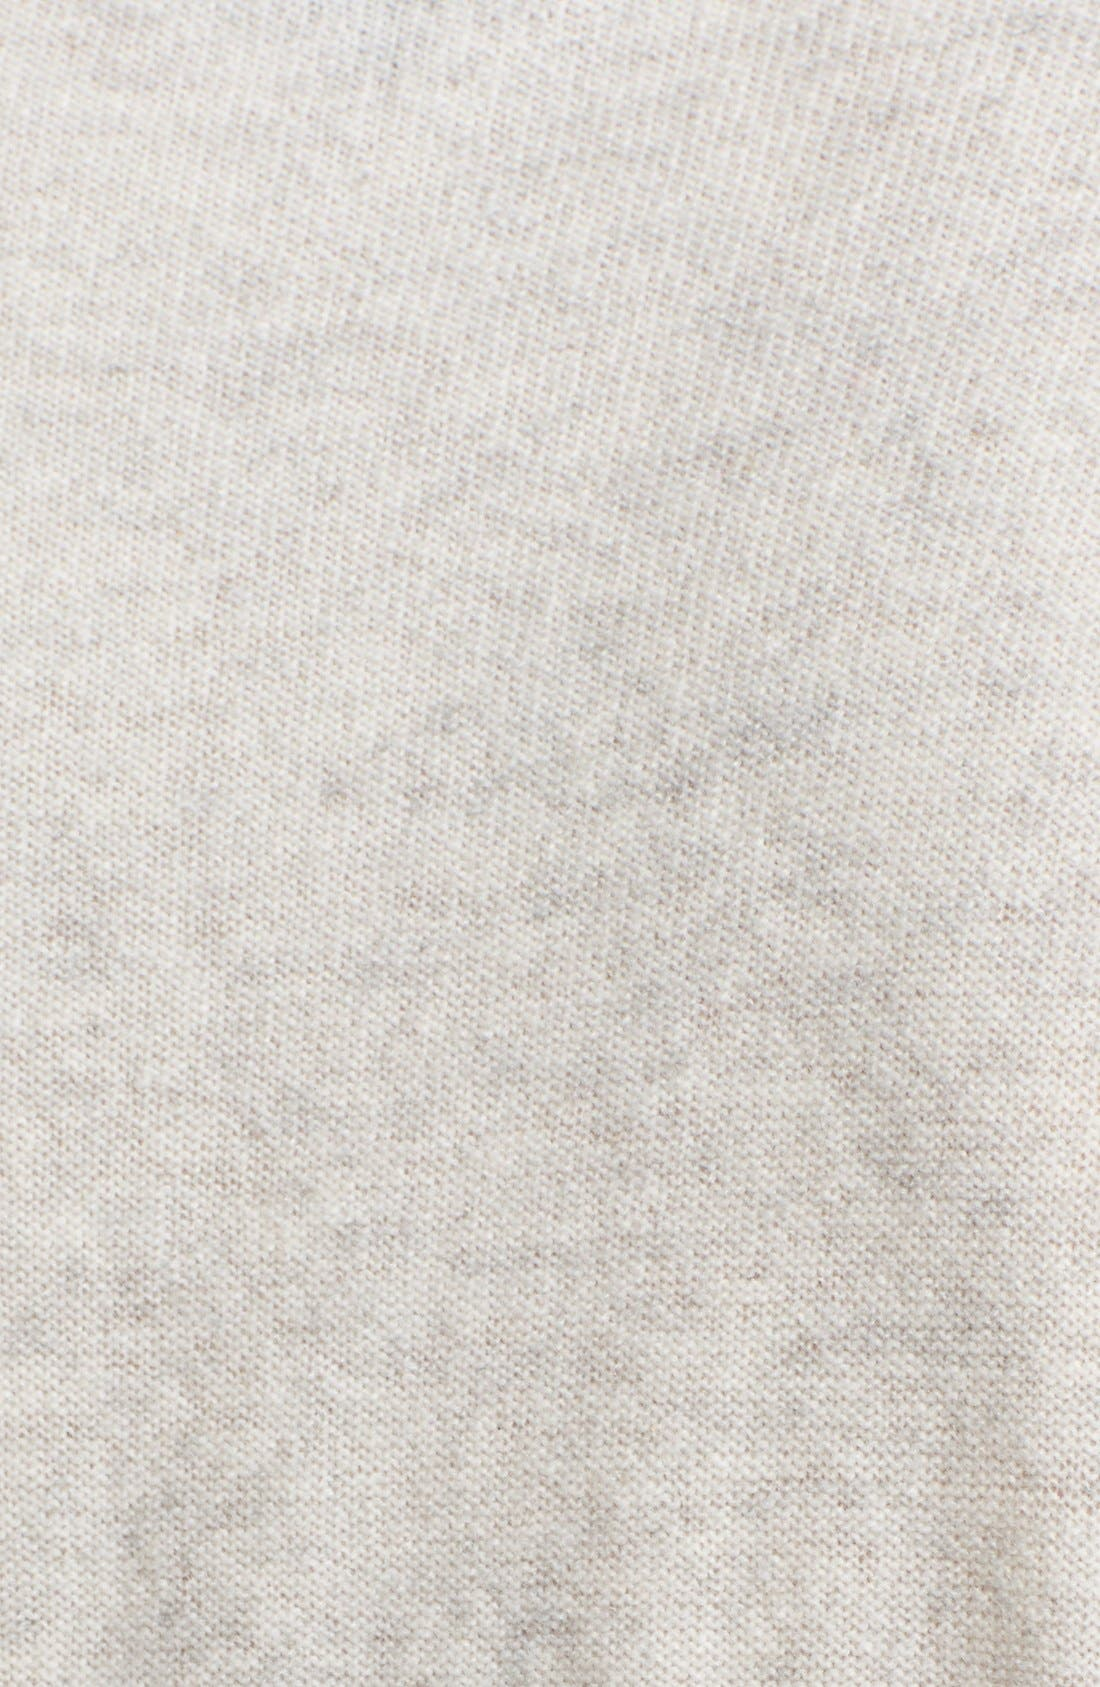 Alternate Image 3  - Vince 'Square' Cashmere Sweater